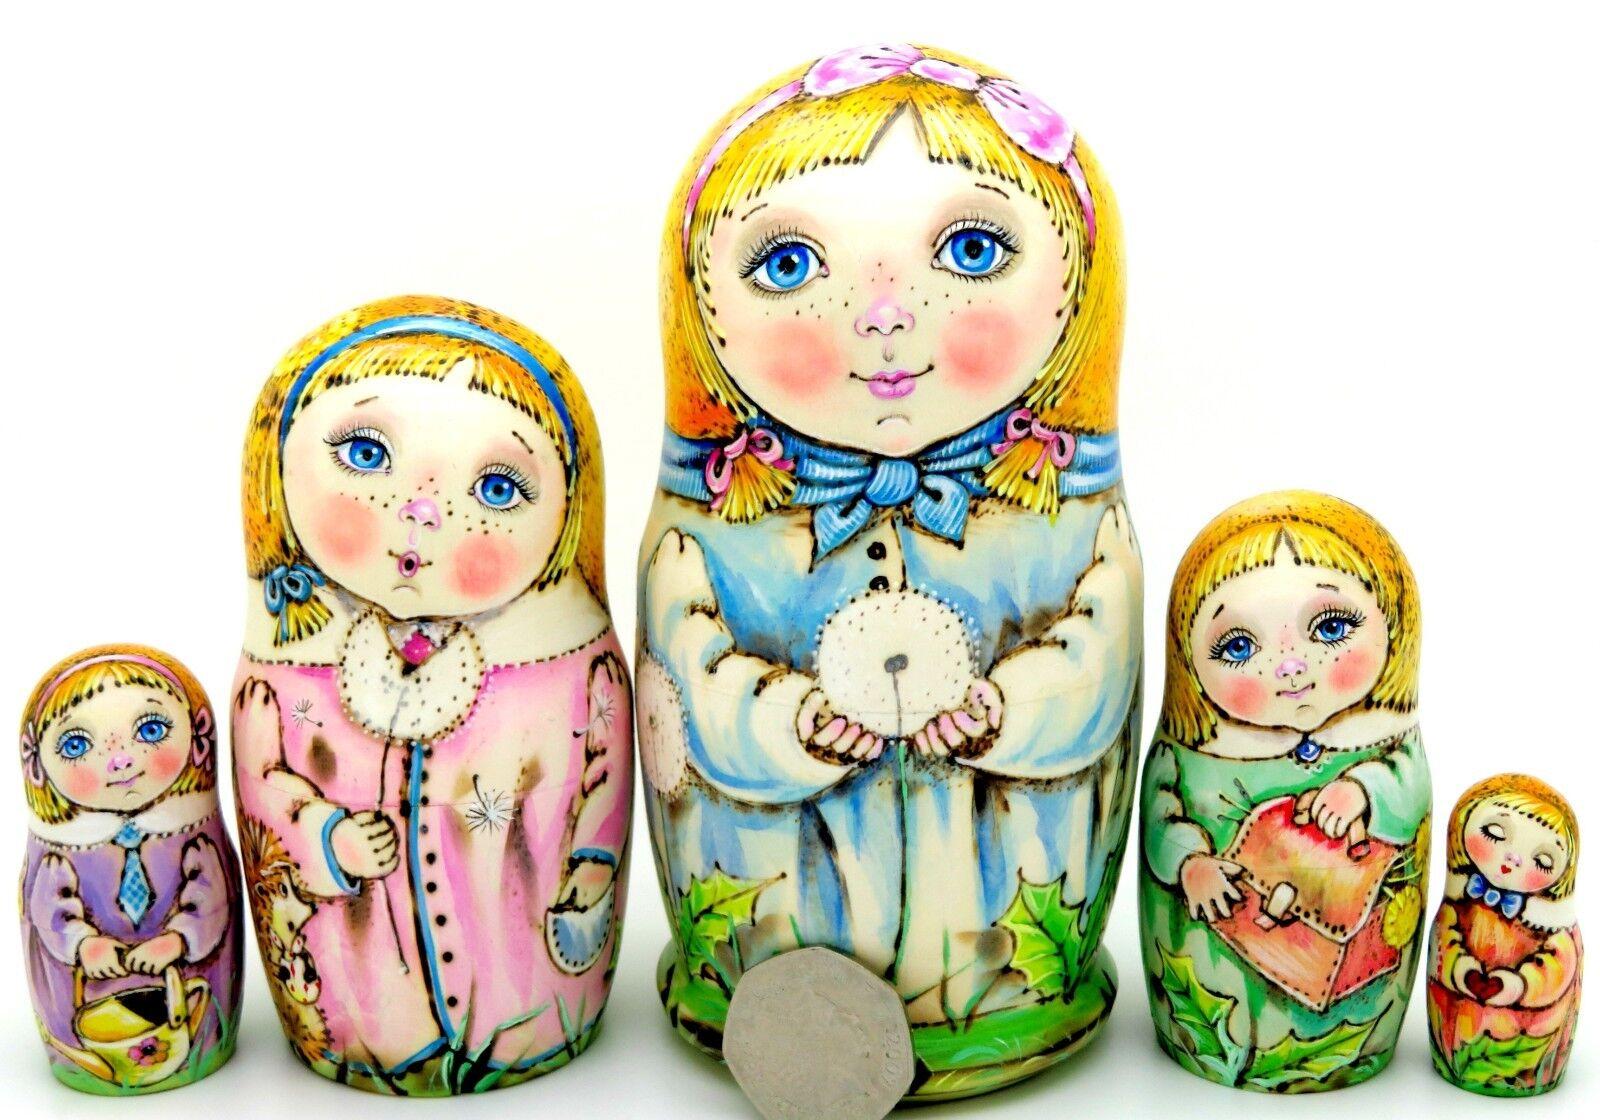 Nidification poupées Russes Matryoshka Babushka 5 pyrogravure filles Chmeleva